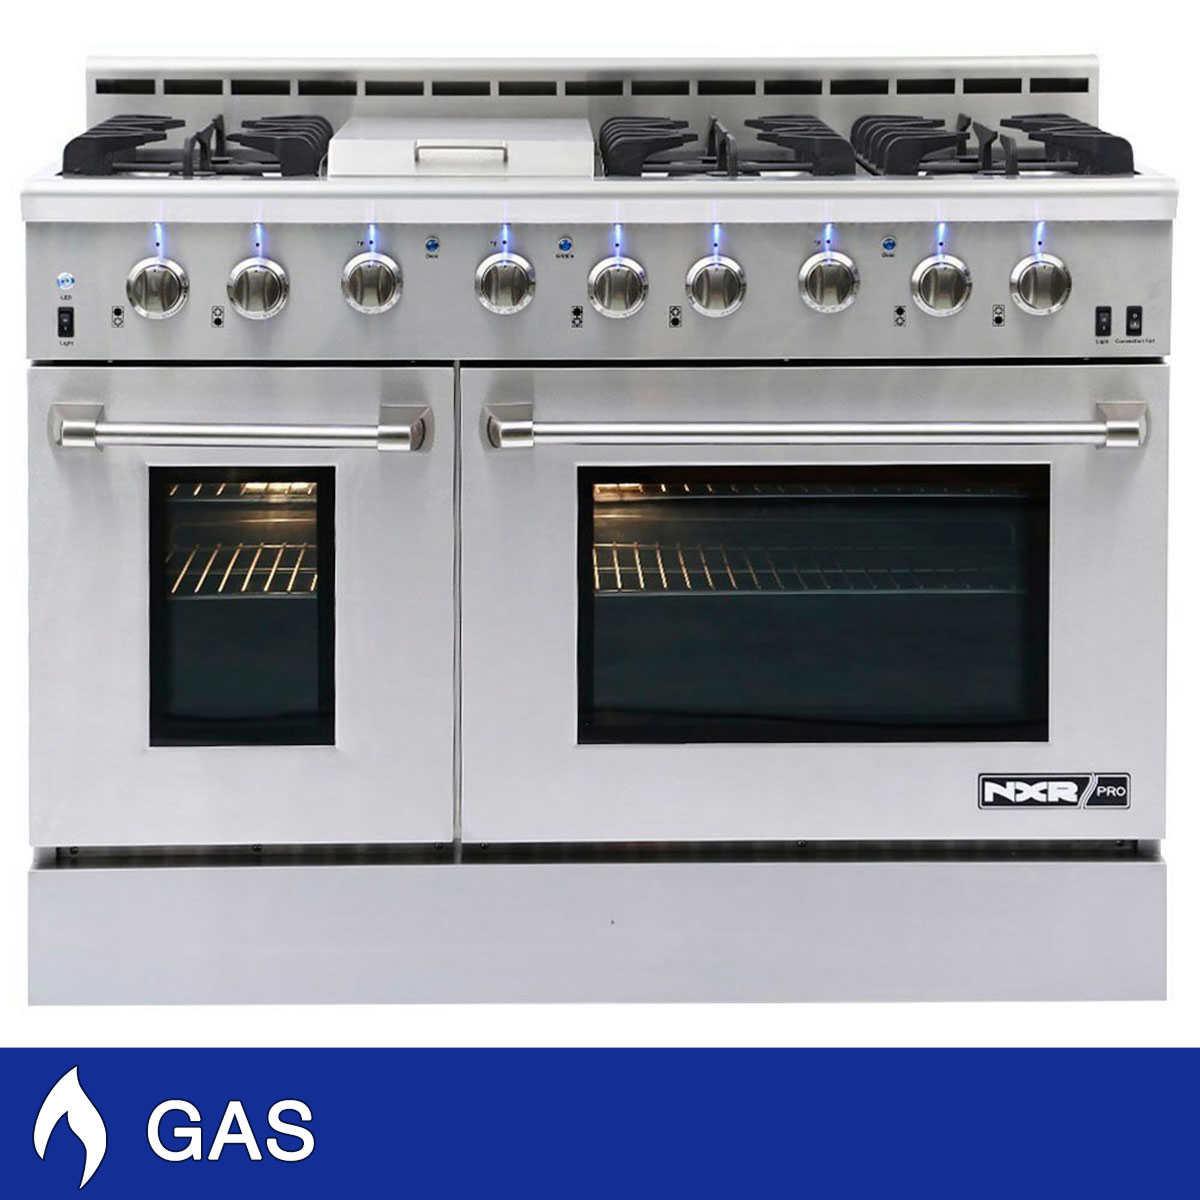 Gas Cooking Appliances ~ Uncategorized costco kitchen appliances wingsioskins